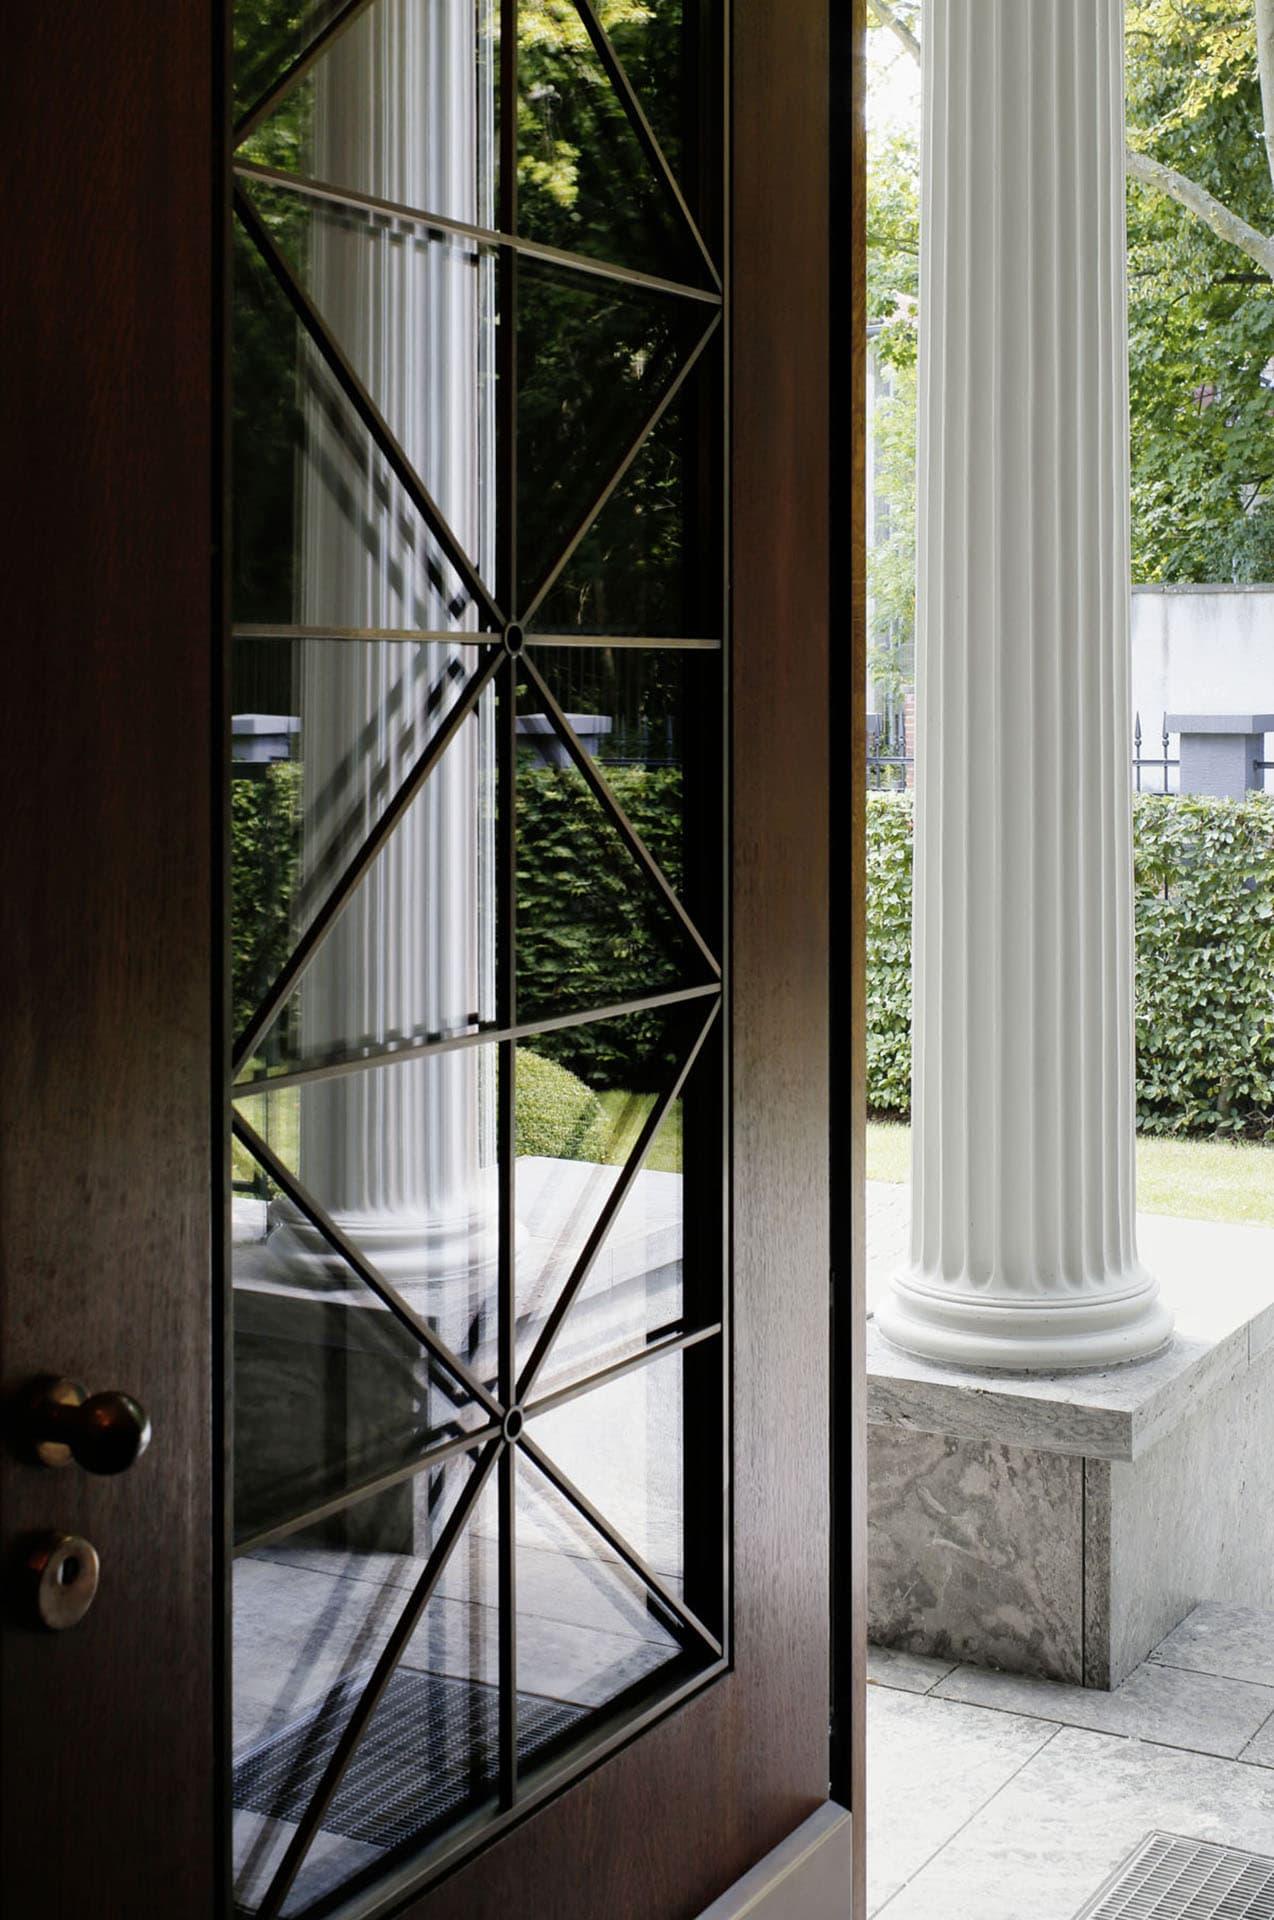 Berlin-Dahlem Peter-Lenne-Str Haus Weyhe Entree